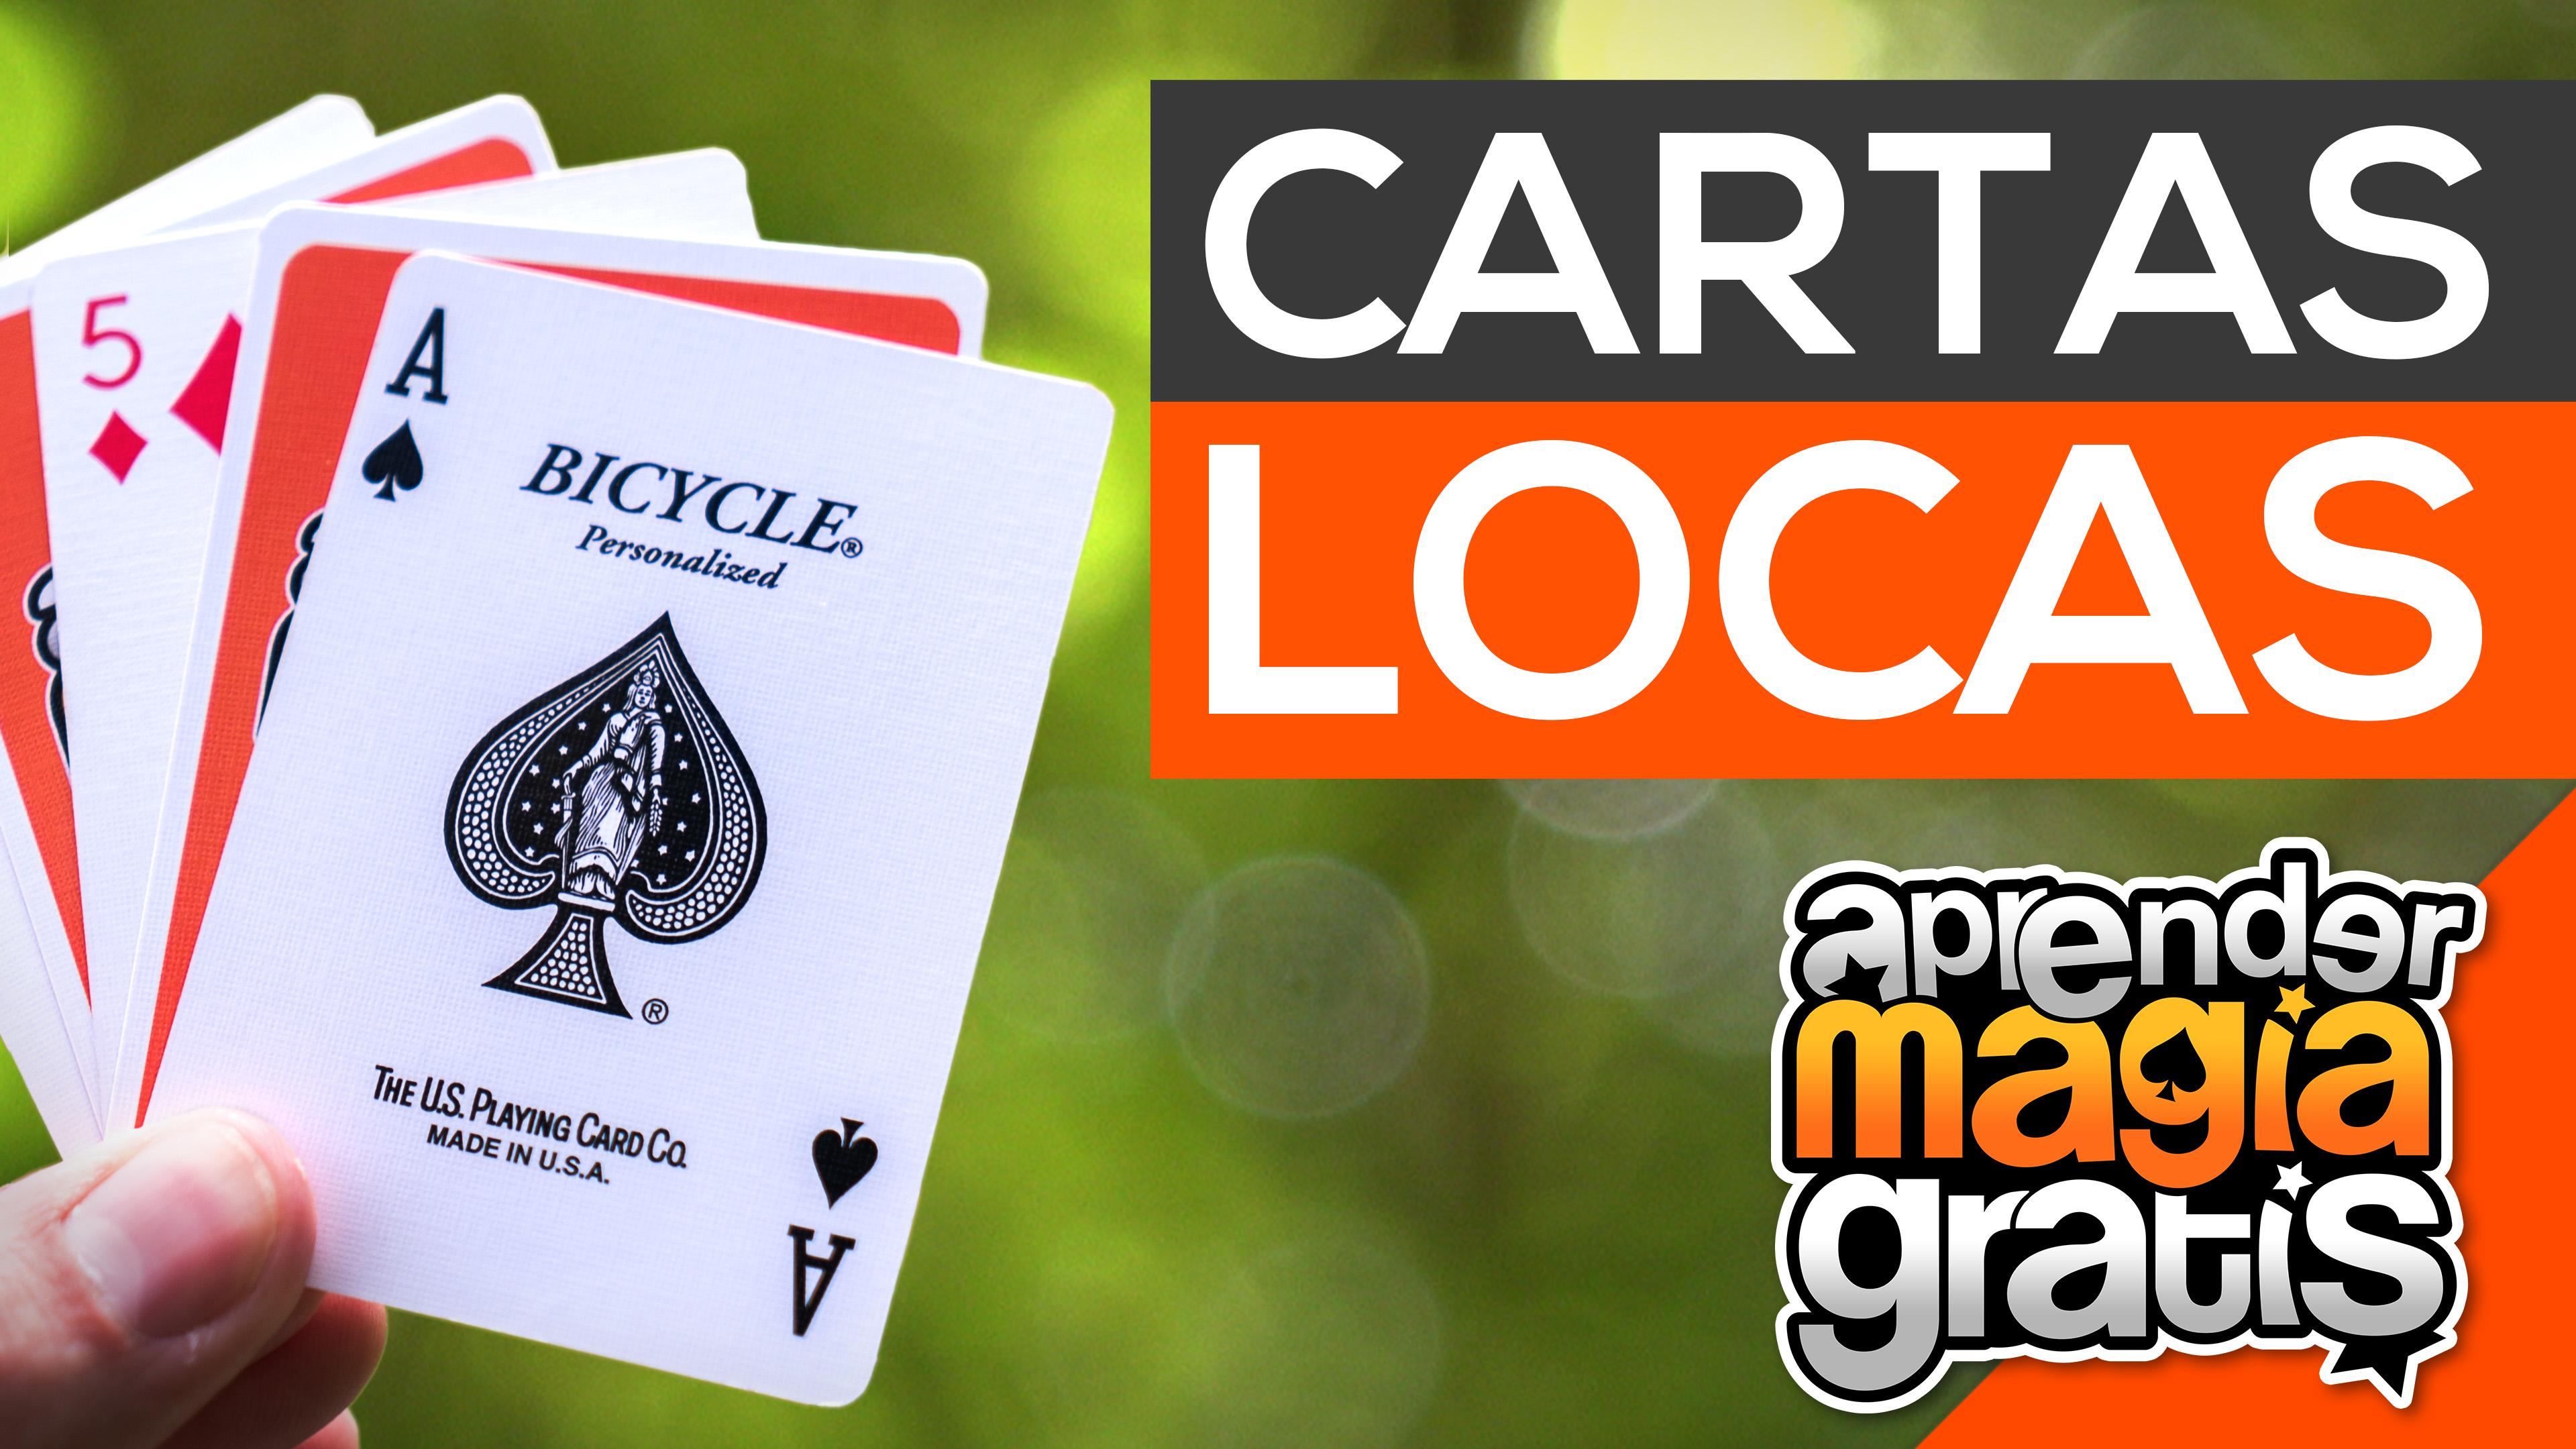 Cartas desordenadas Trucos de magia revelados Aprender magia gratis